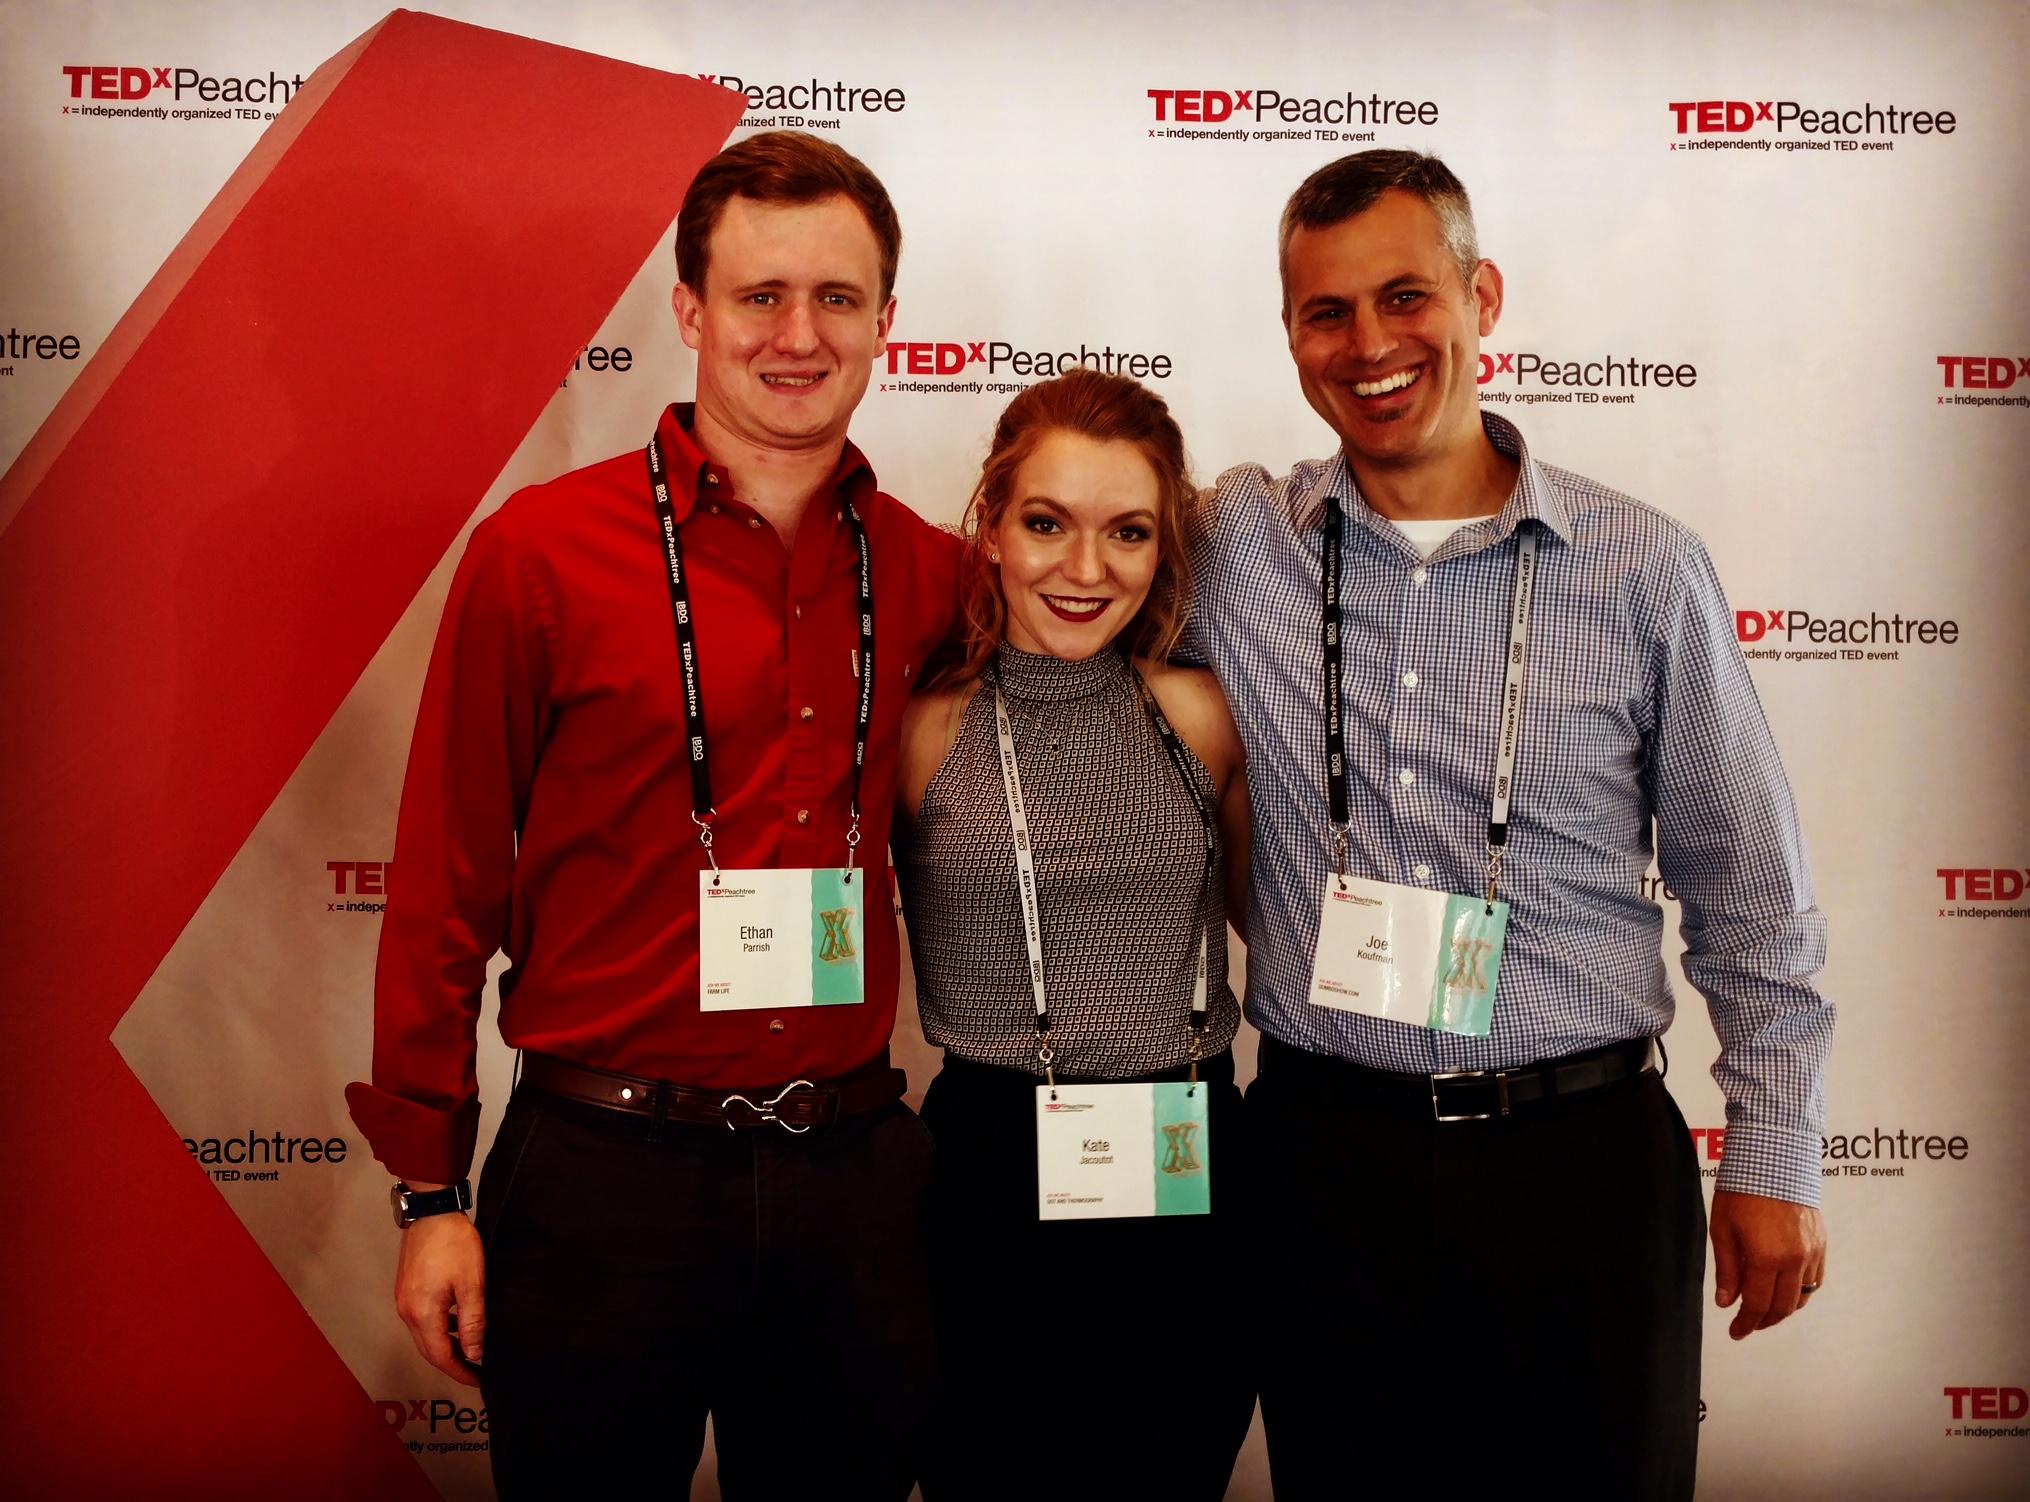 Ethan Parrish, Kate Jacoutot, Joe Koufman - AgencySparksteam at TEDxPeachtree